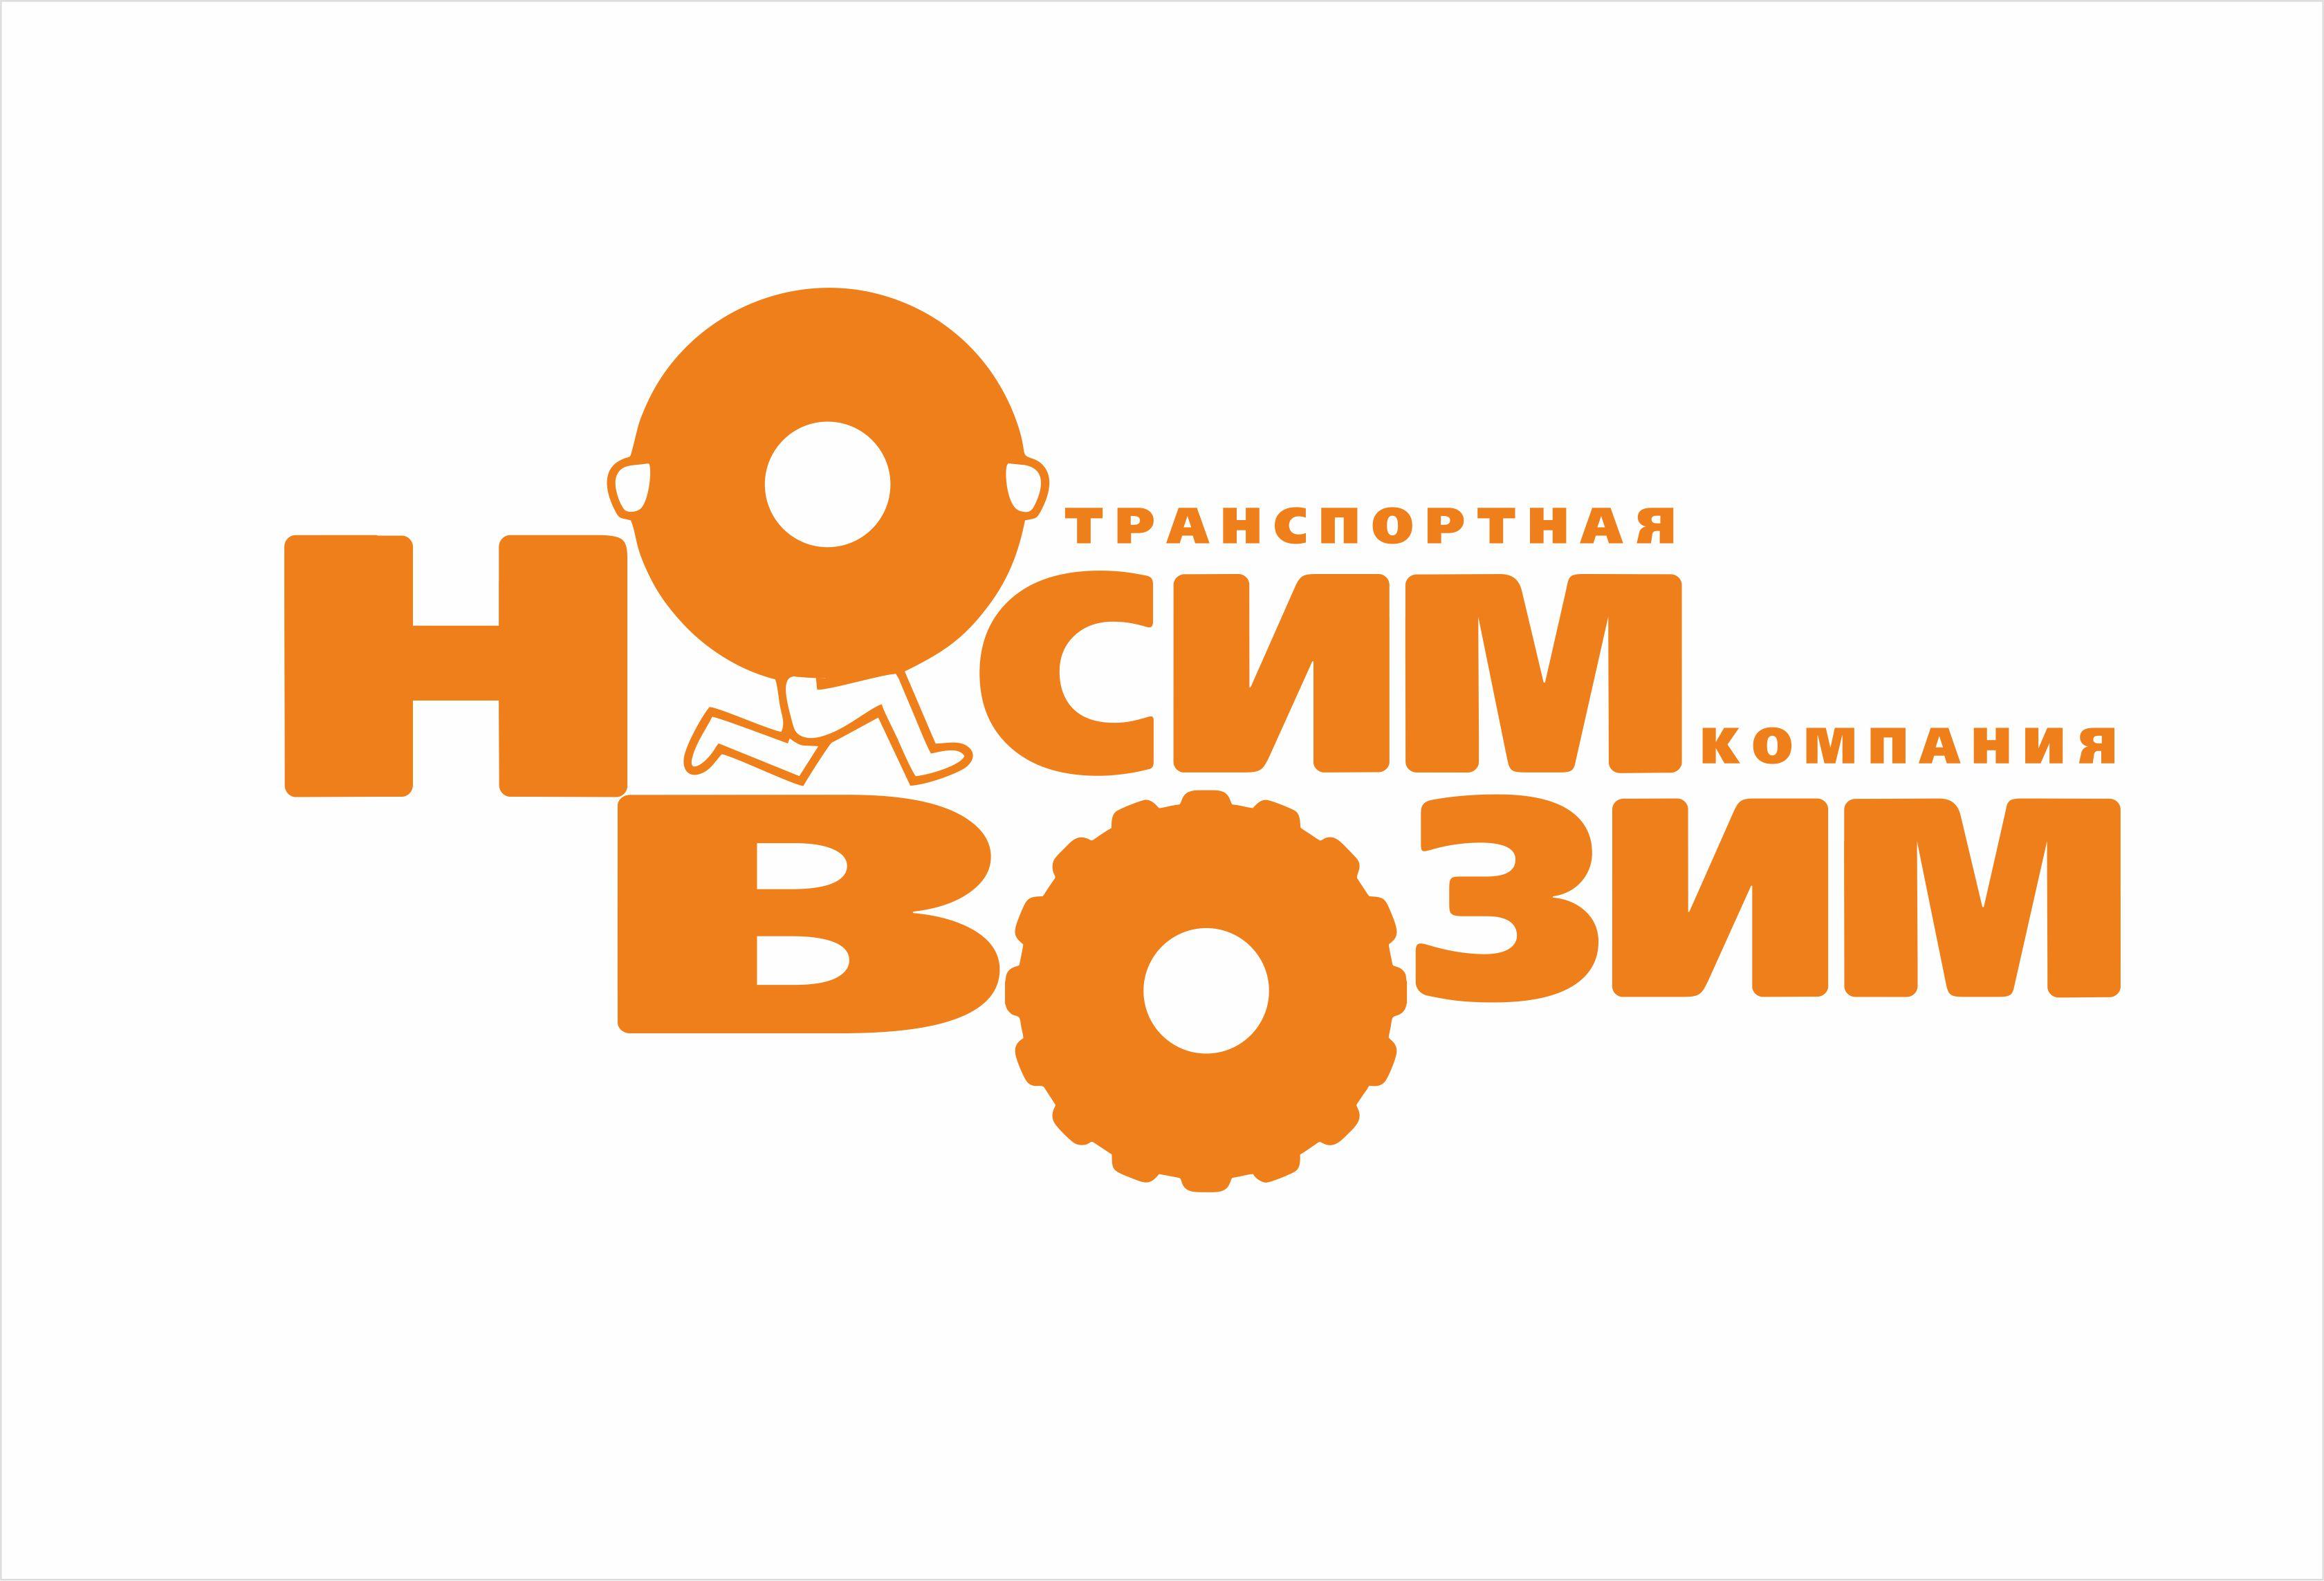 Логотип компании по перевозкам НосимВозим фото f_2825cf7a12c1c4ba.jpg